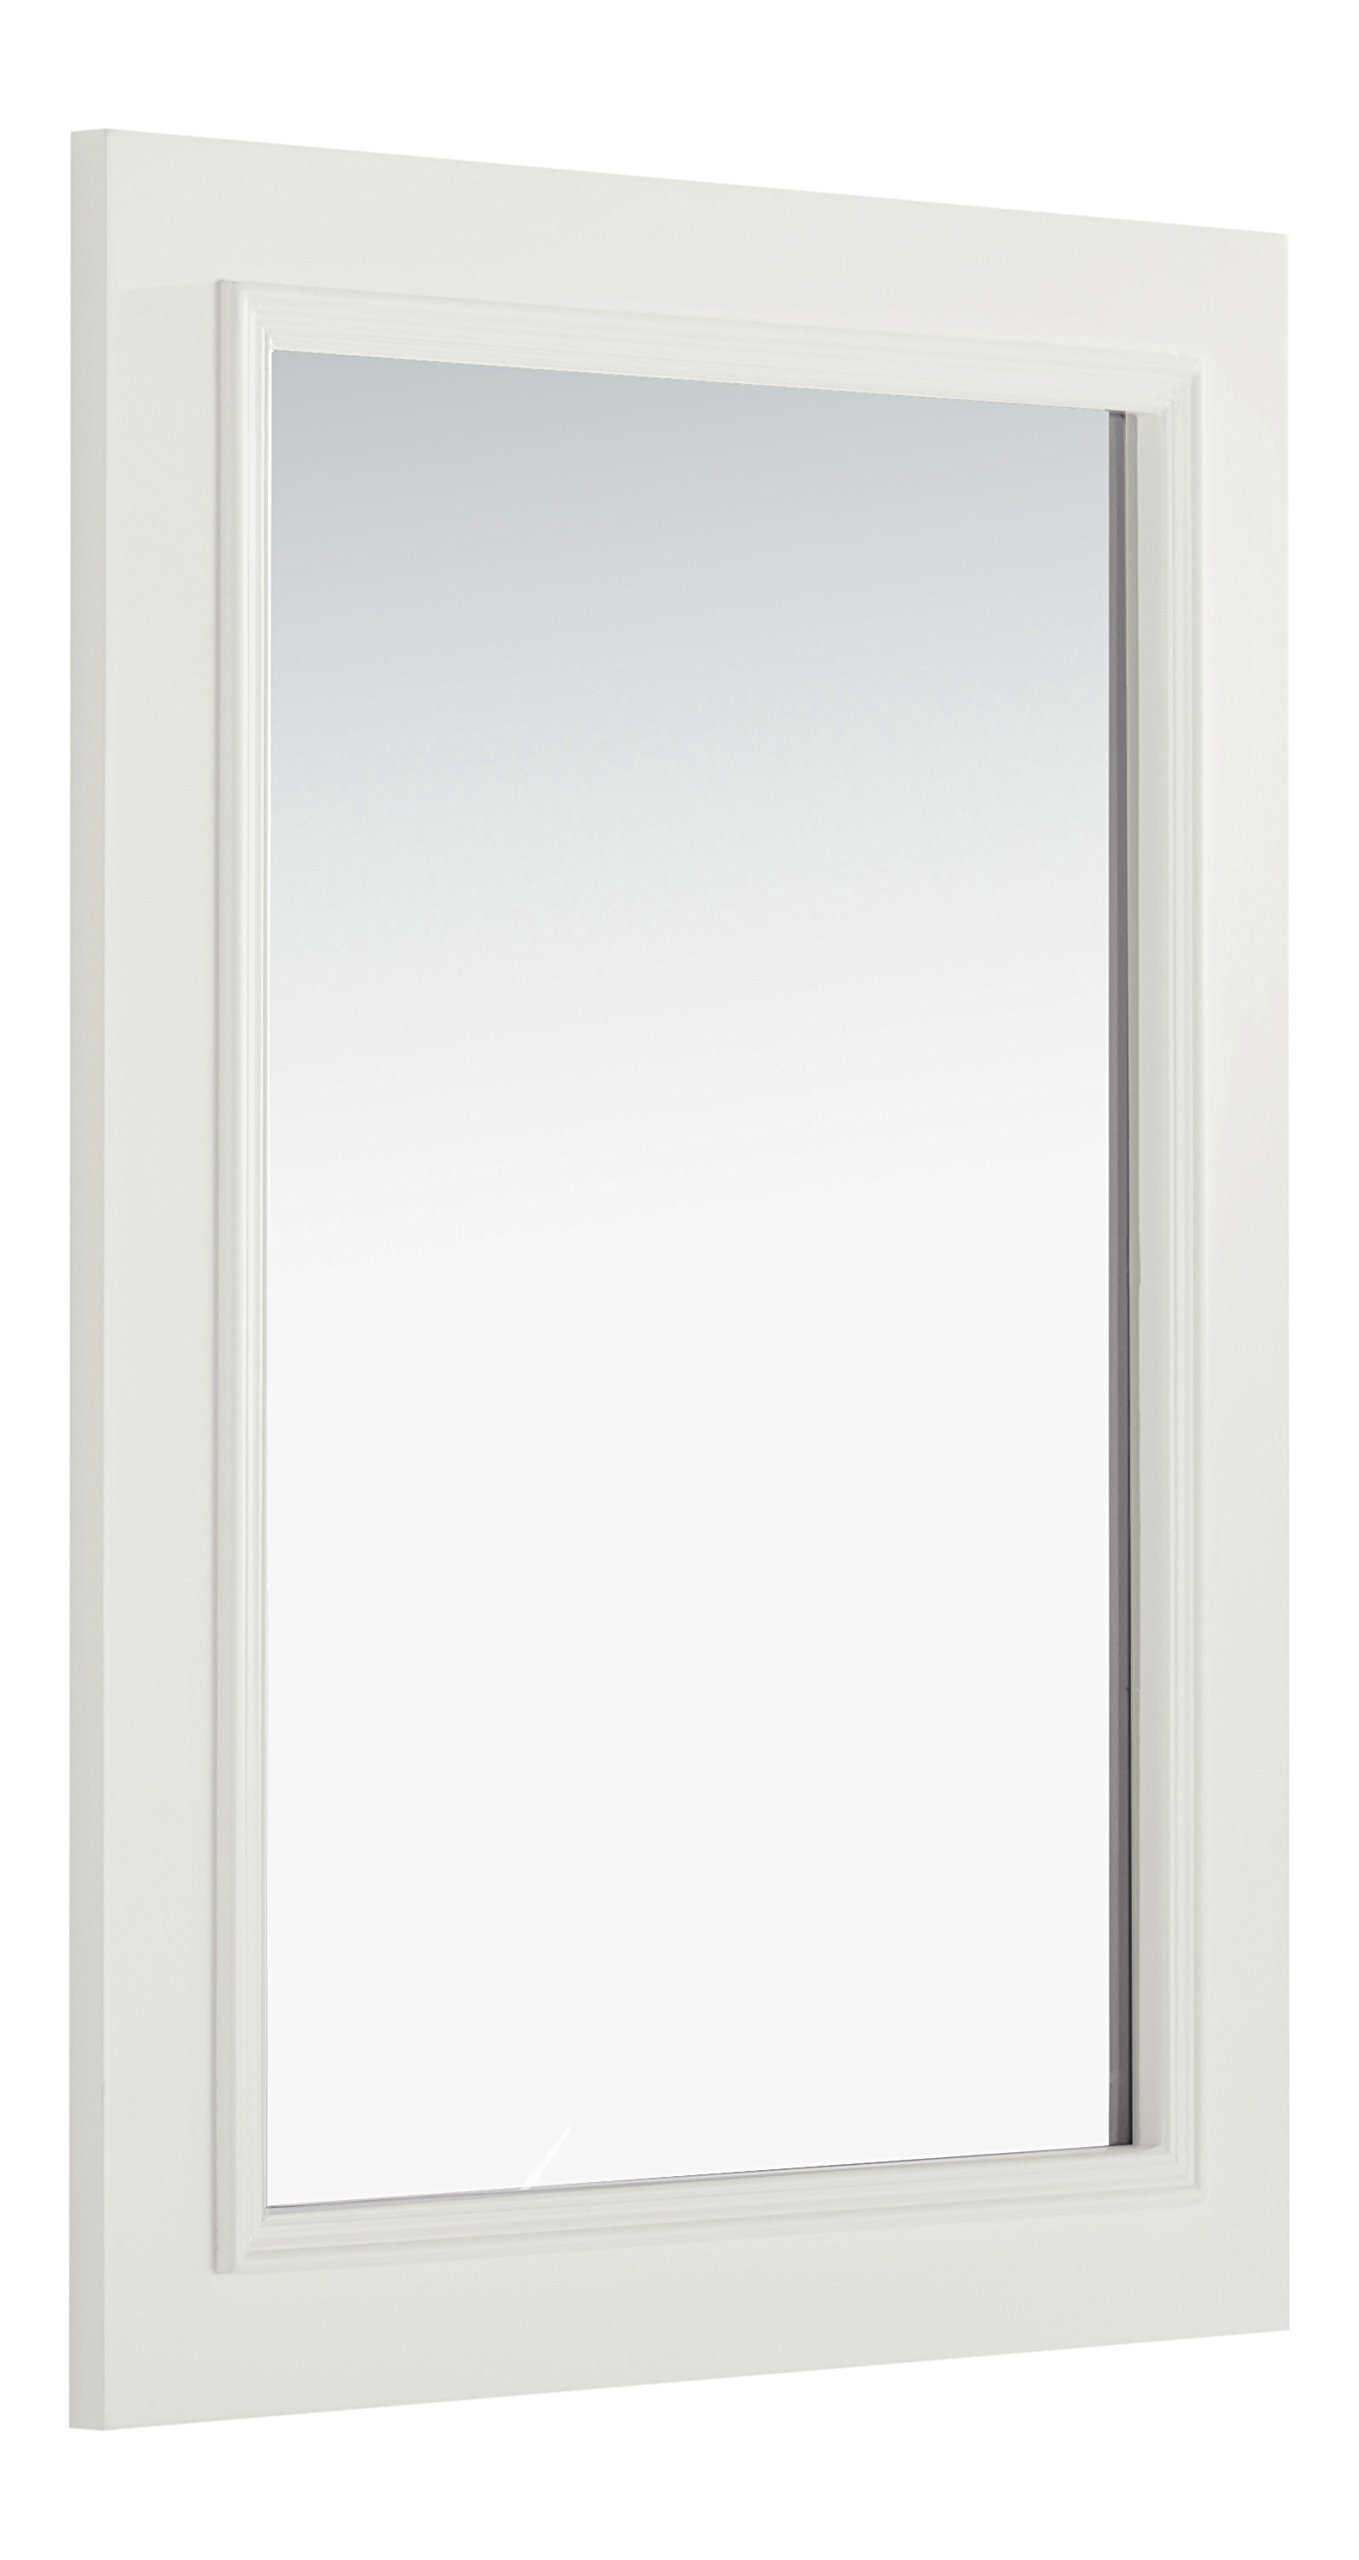 Simpli Home Cambridge Bath Vanity Mirror, 22'' x 30'', White